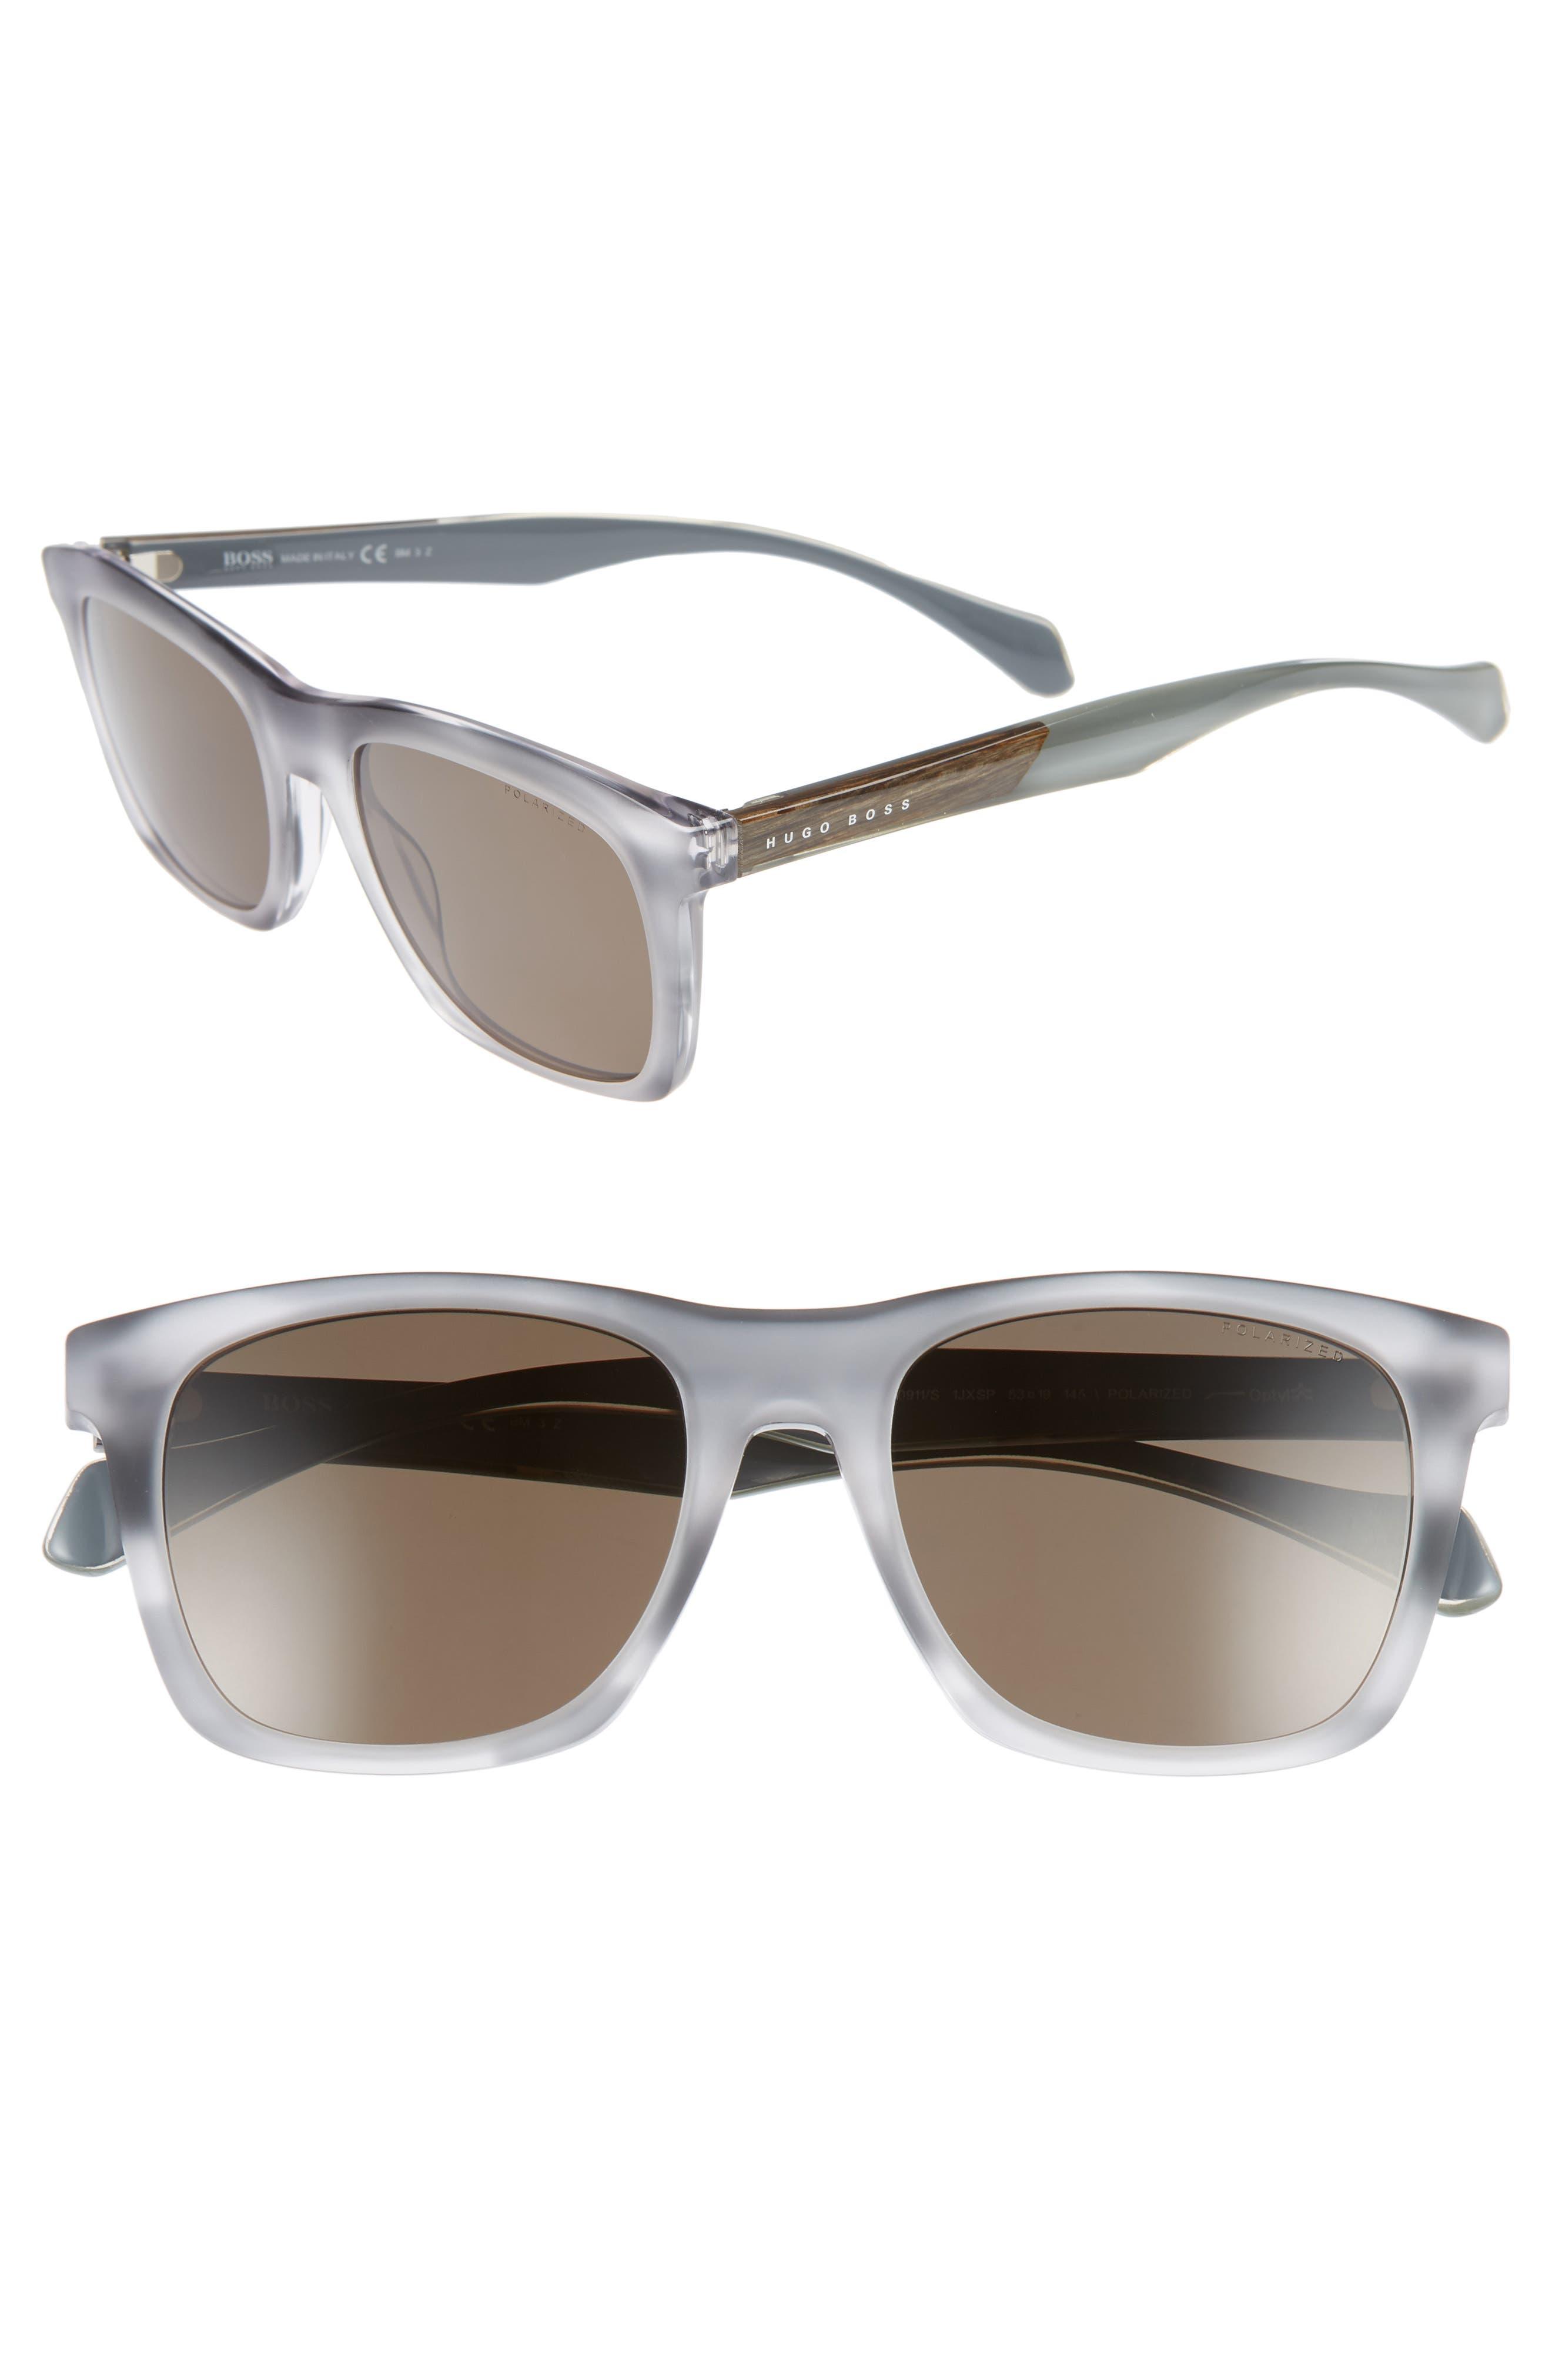 53mm Polarized Sunglasses,                             Main thumbnail 1, color,                             GREY/ BRONZE